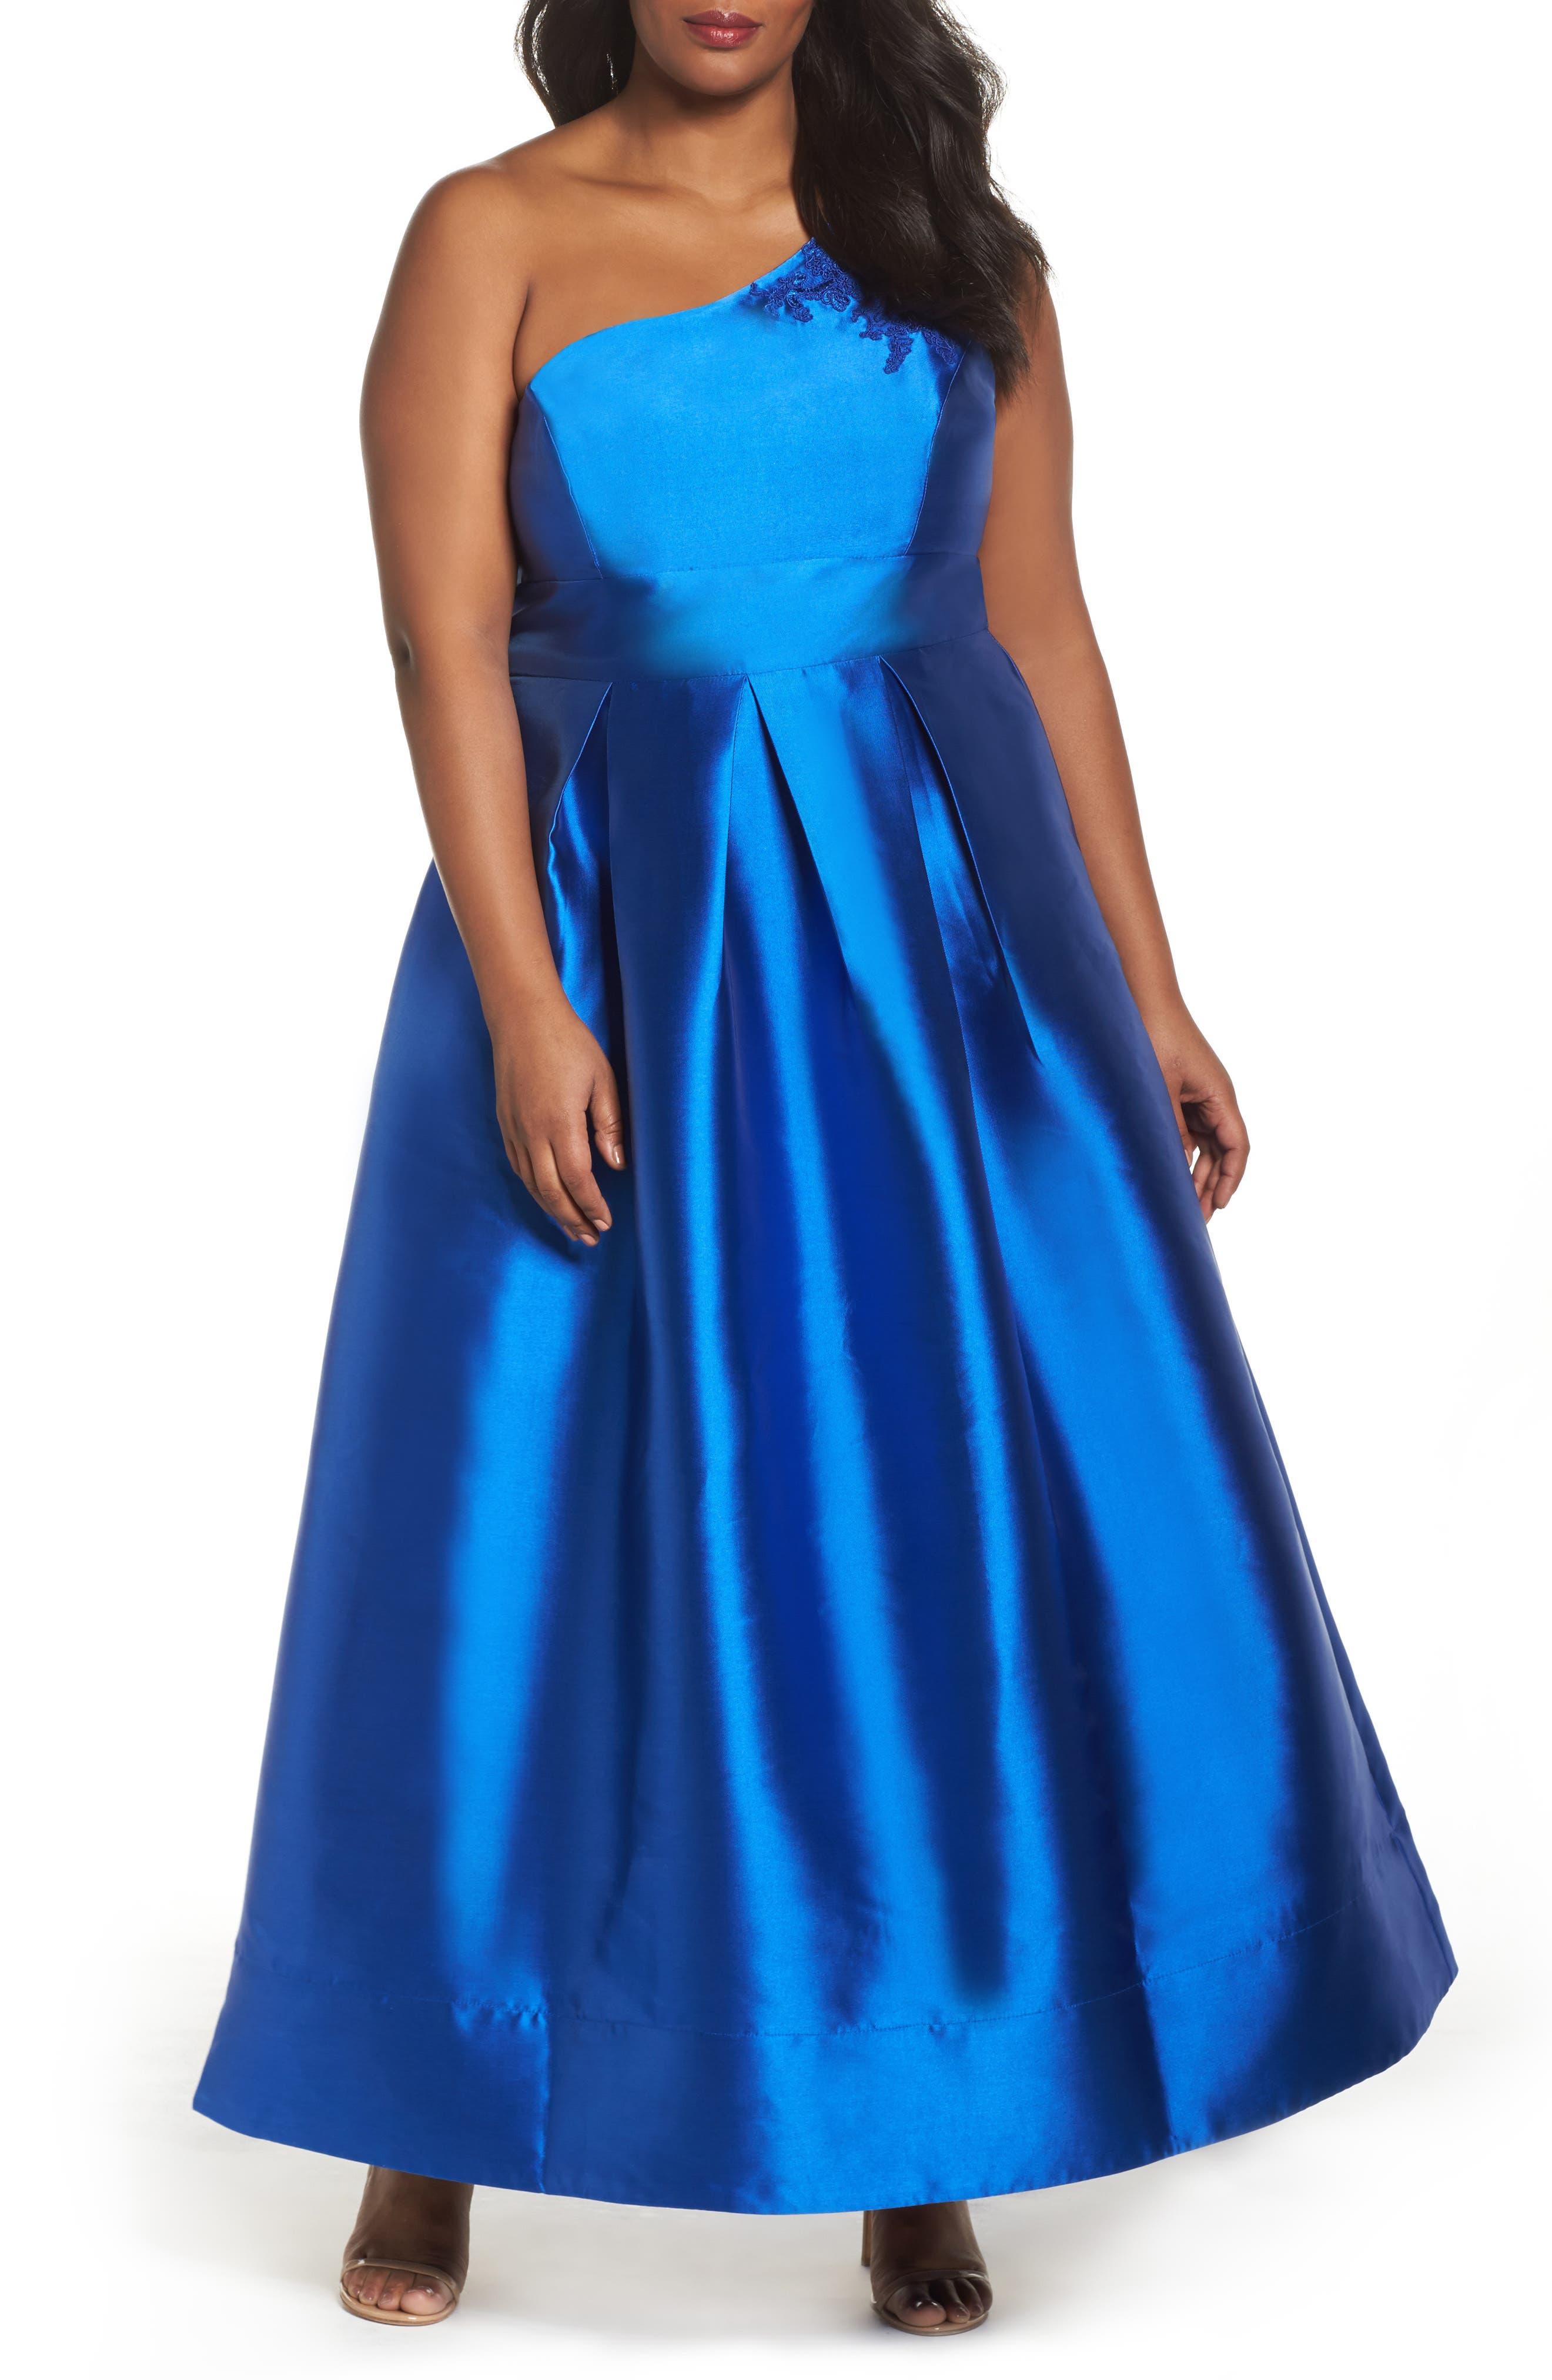 Alternate Image 1 Selected - Sangria Appliquéd One Shoulder Ballgown (Plus Size)